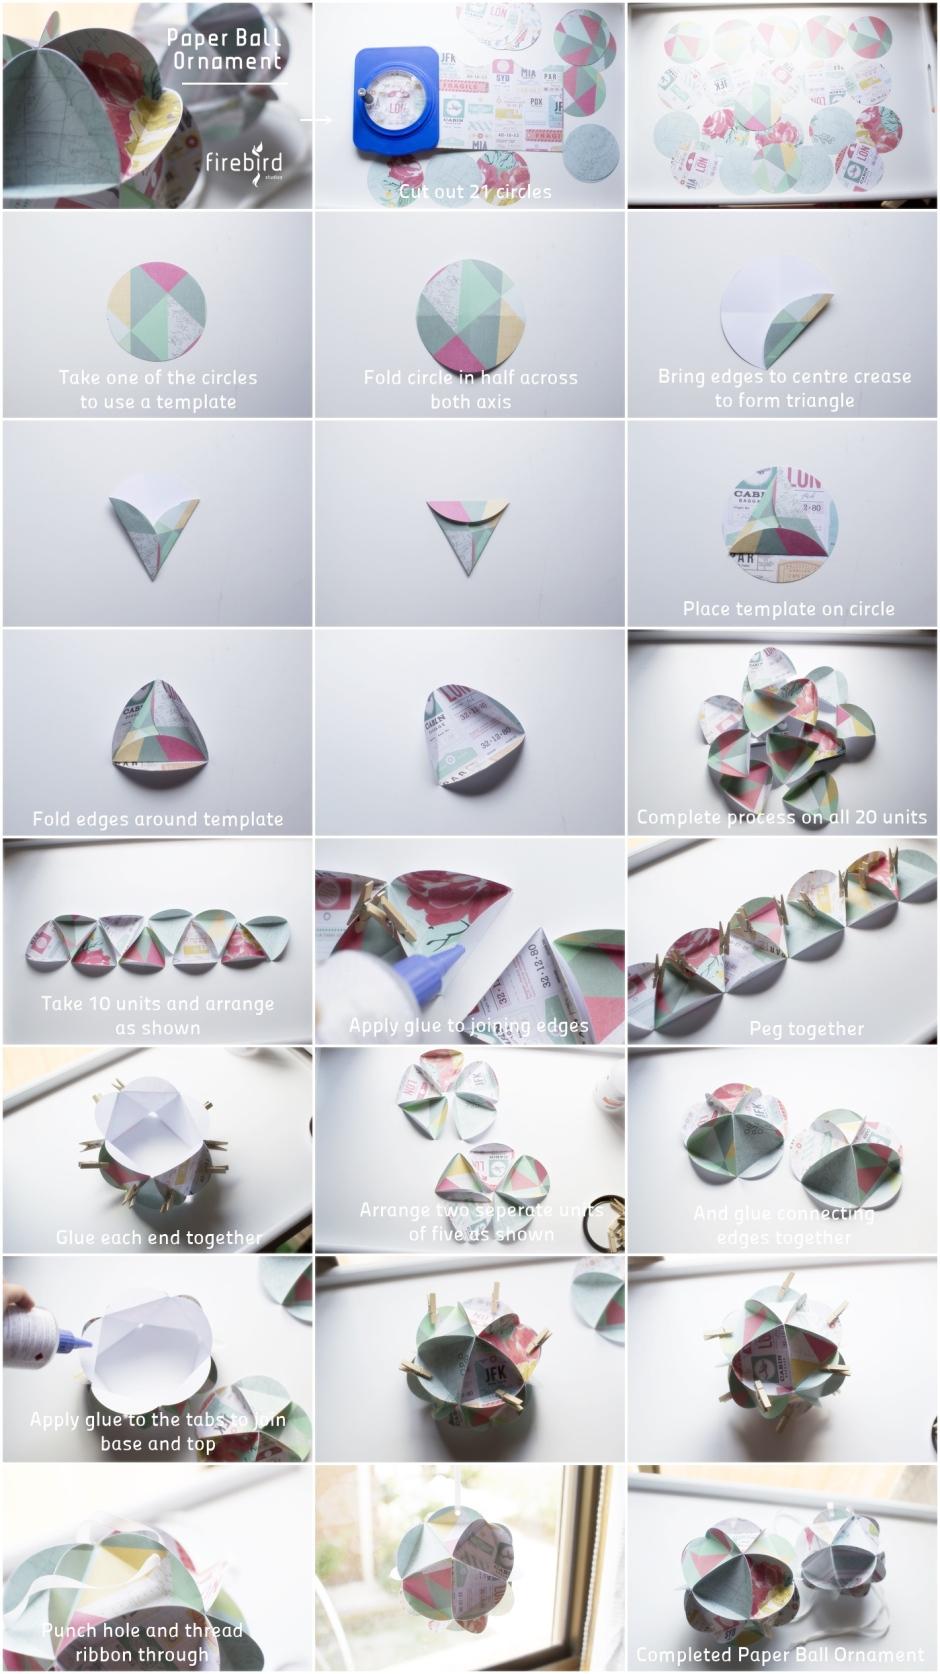 Paper Ball Ornament_blog instructions